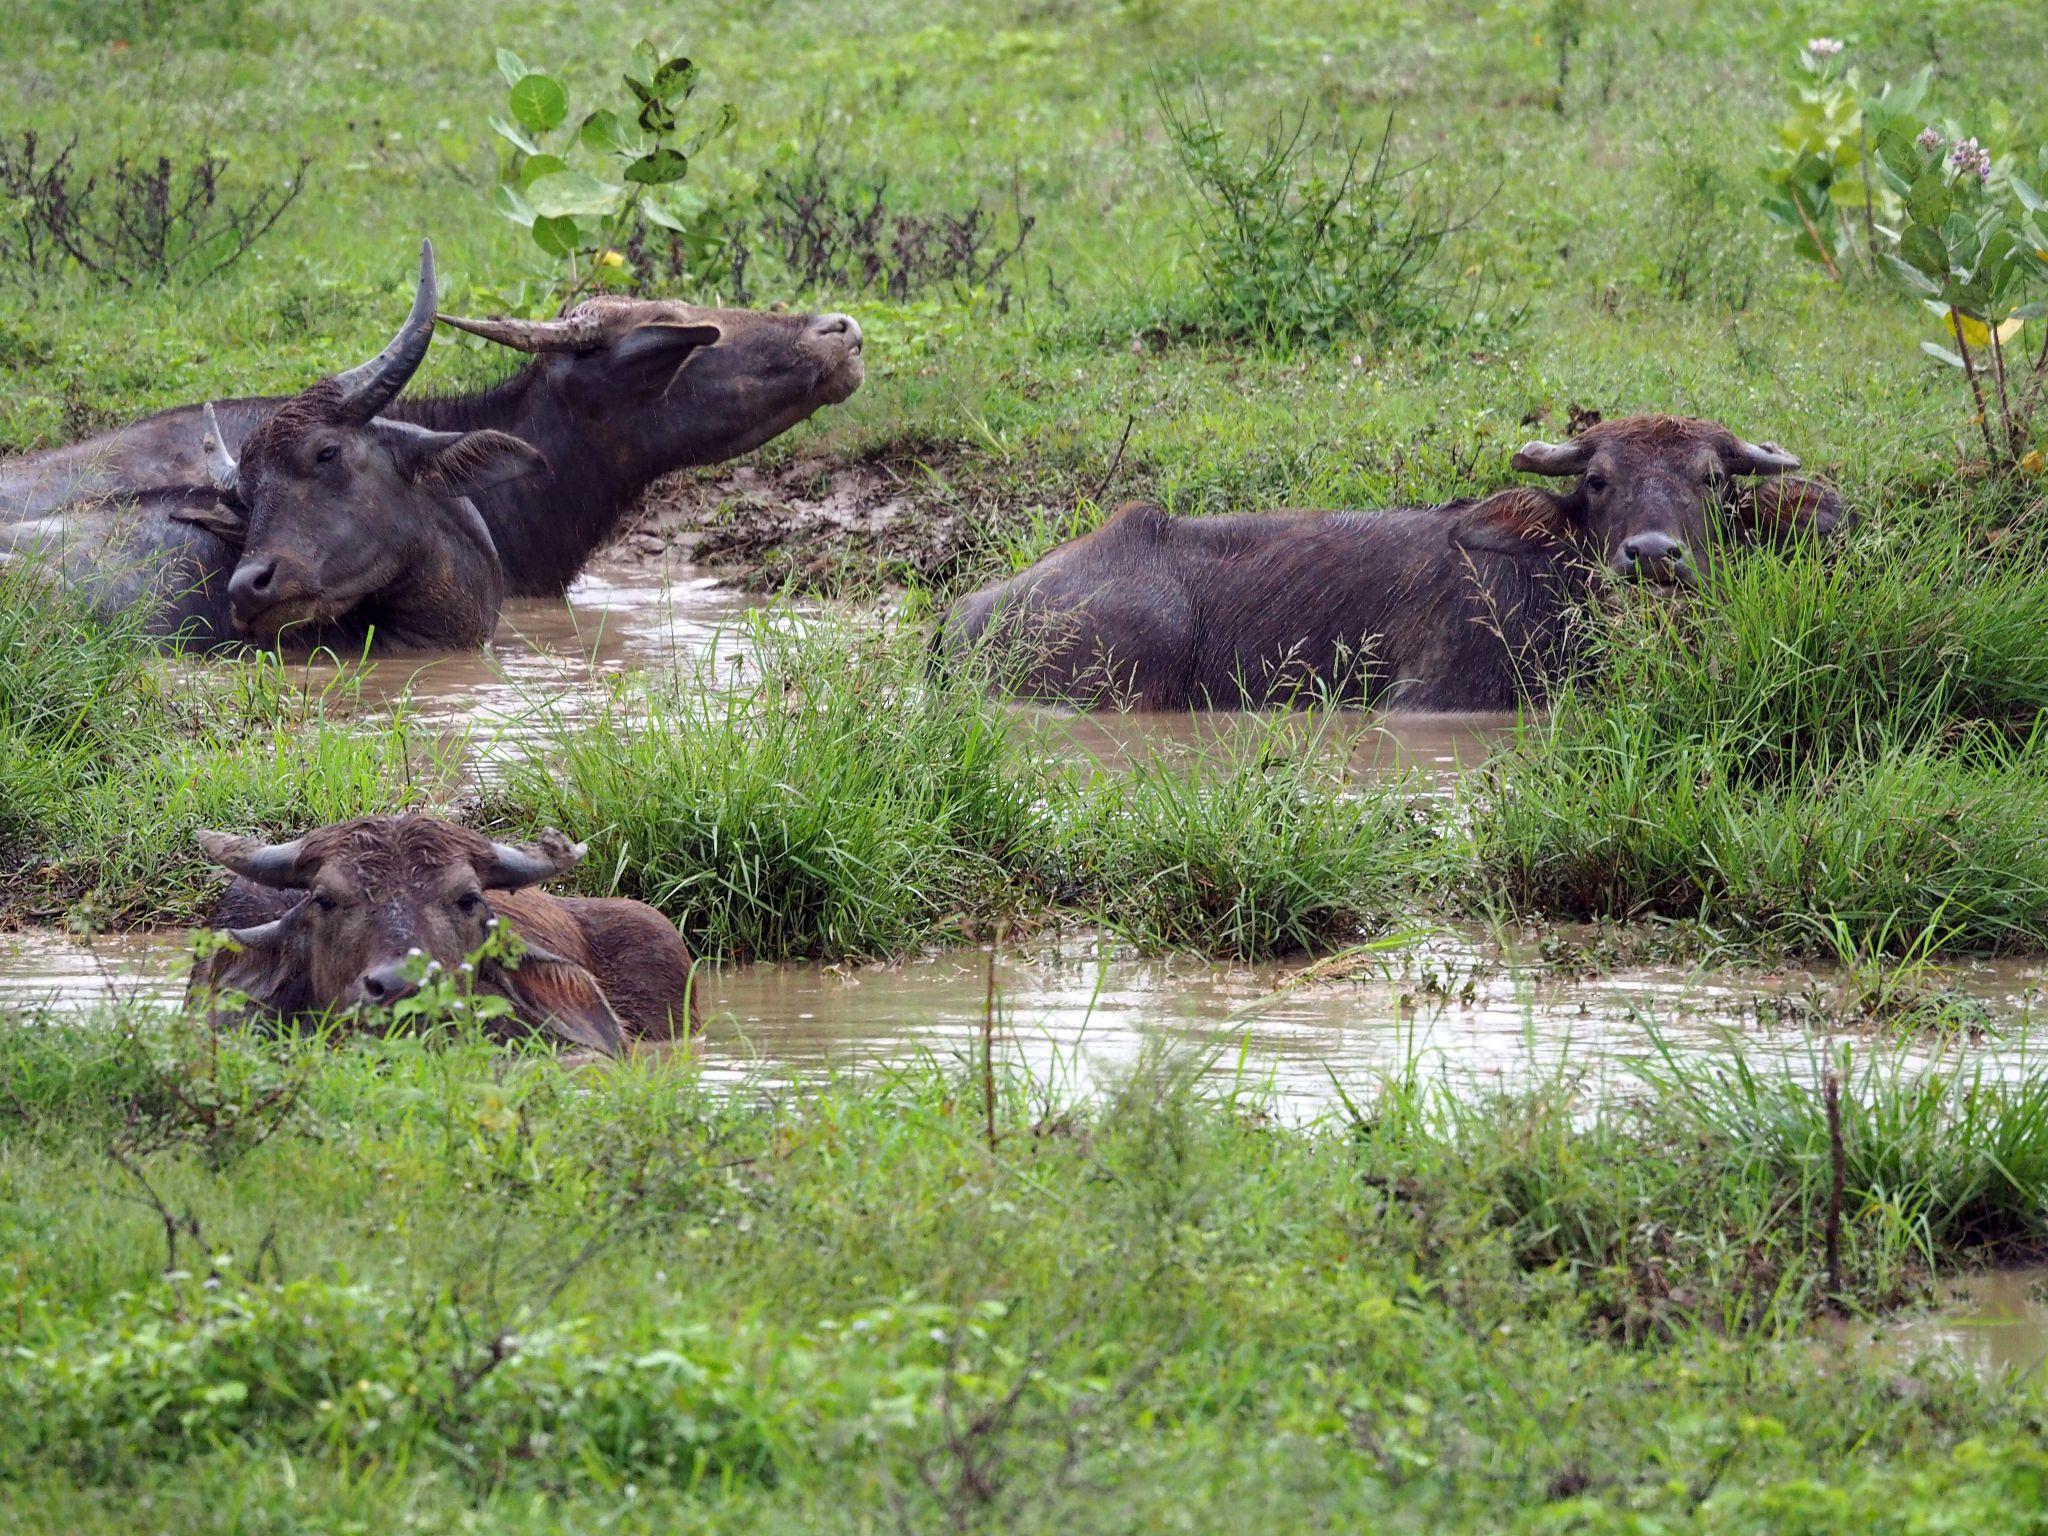 Water buffalo in water Udawalwe National Park